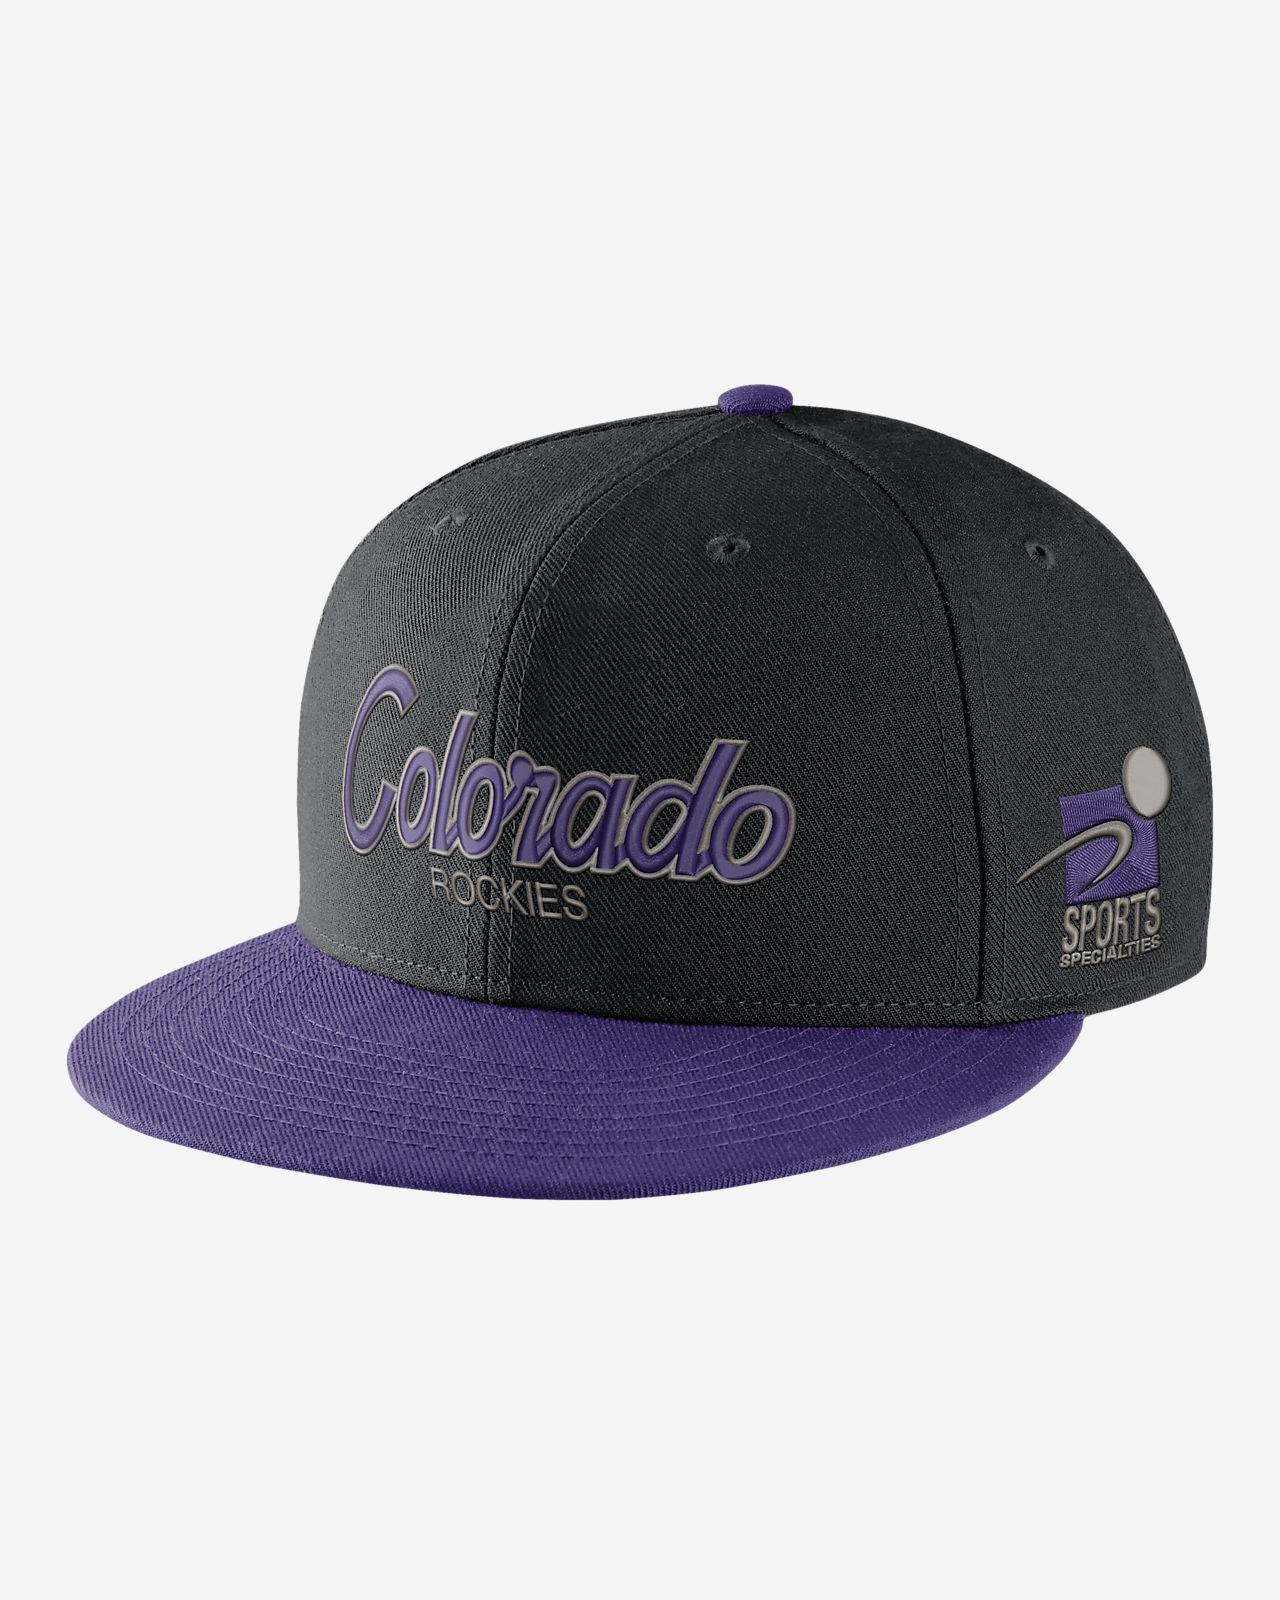 21bc77fc6e7 Nike Pro Sport Specialties (MLB Rockies) Adjustable Hat. Nike.com